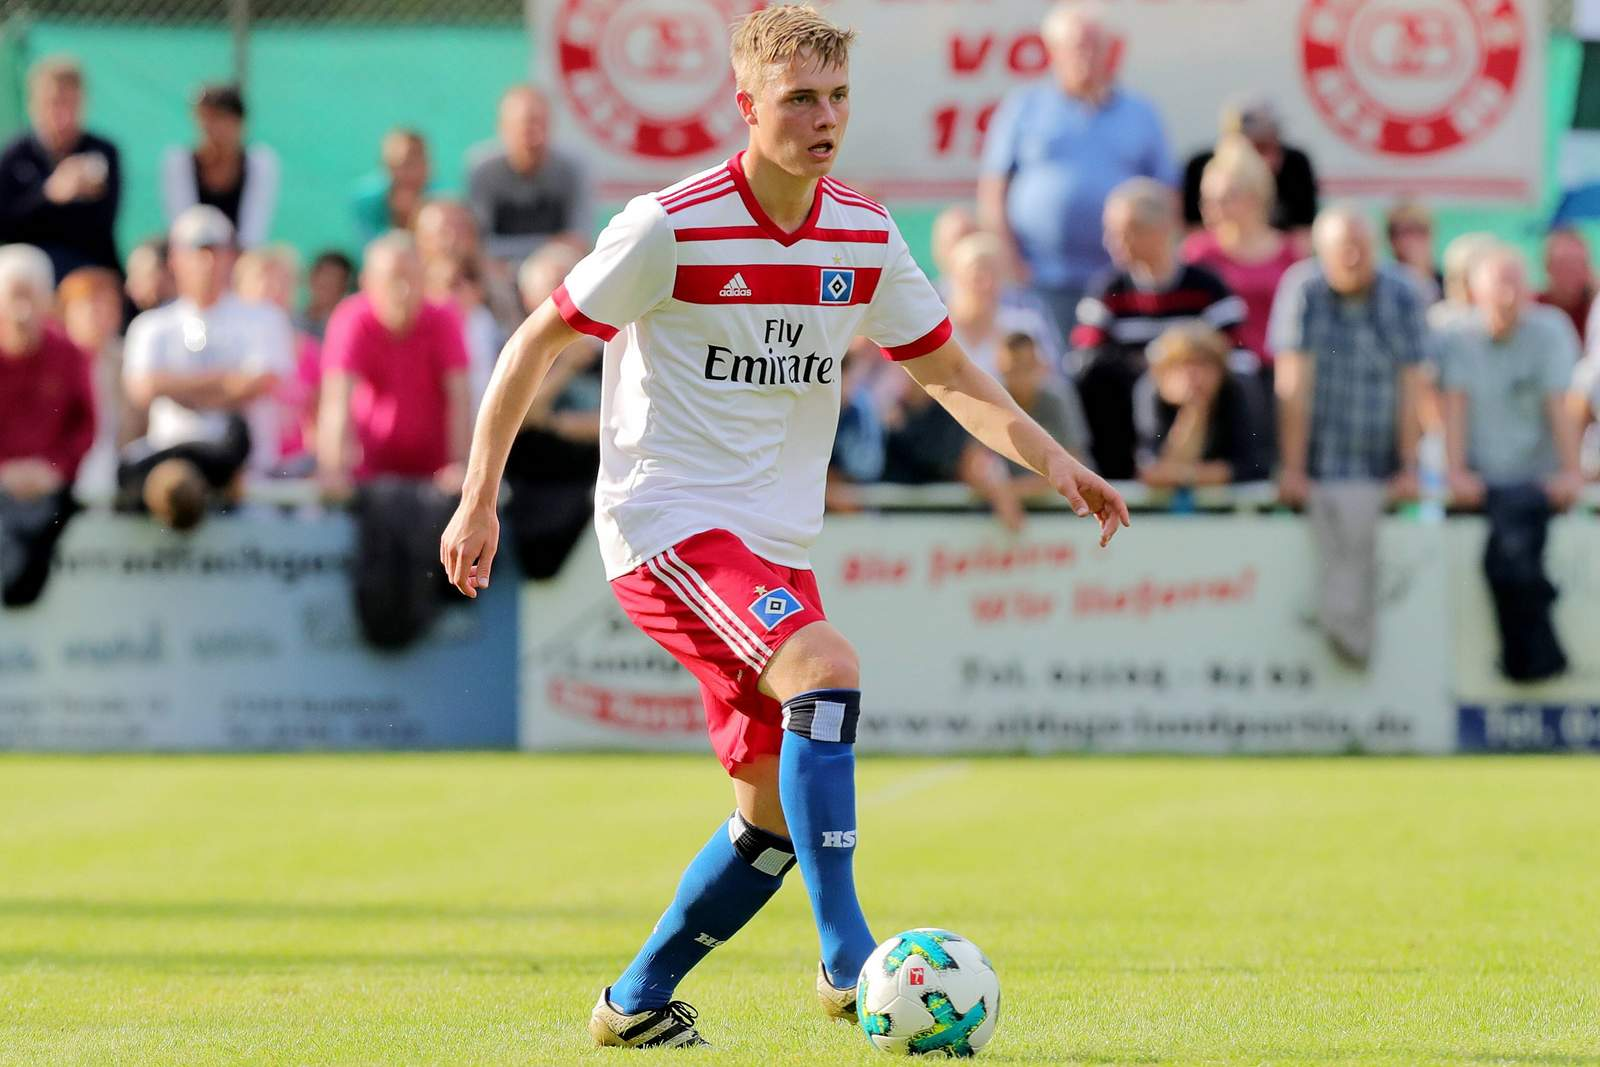 Finn Porath vom Hamburger SV